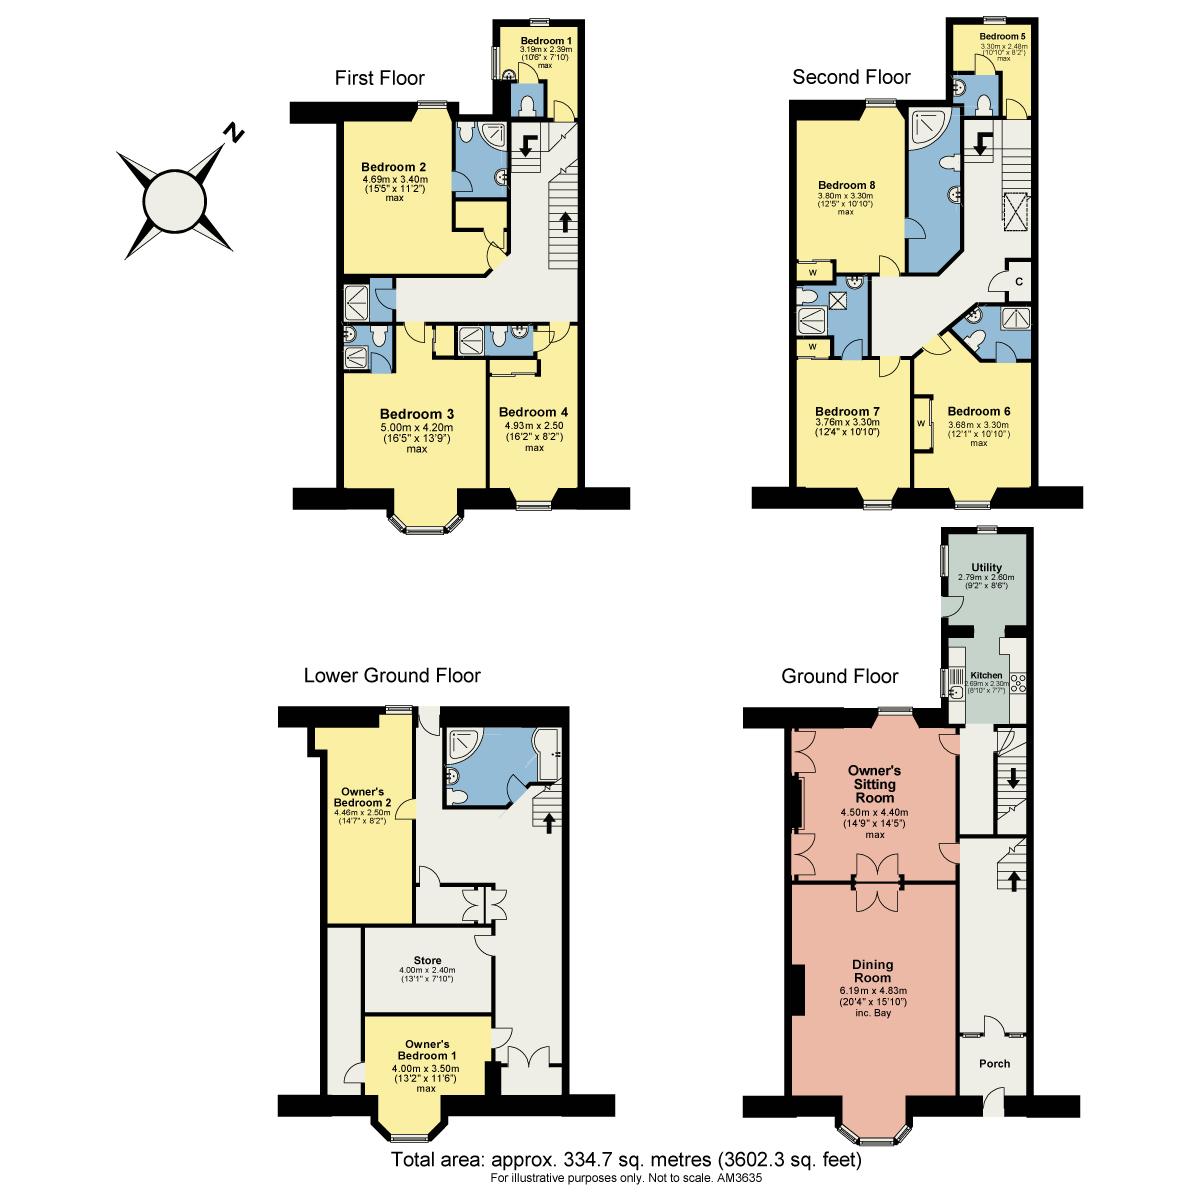 Floorplan Norwood House, Church Street, Ambleside, Cumbria, LA22 0BT